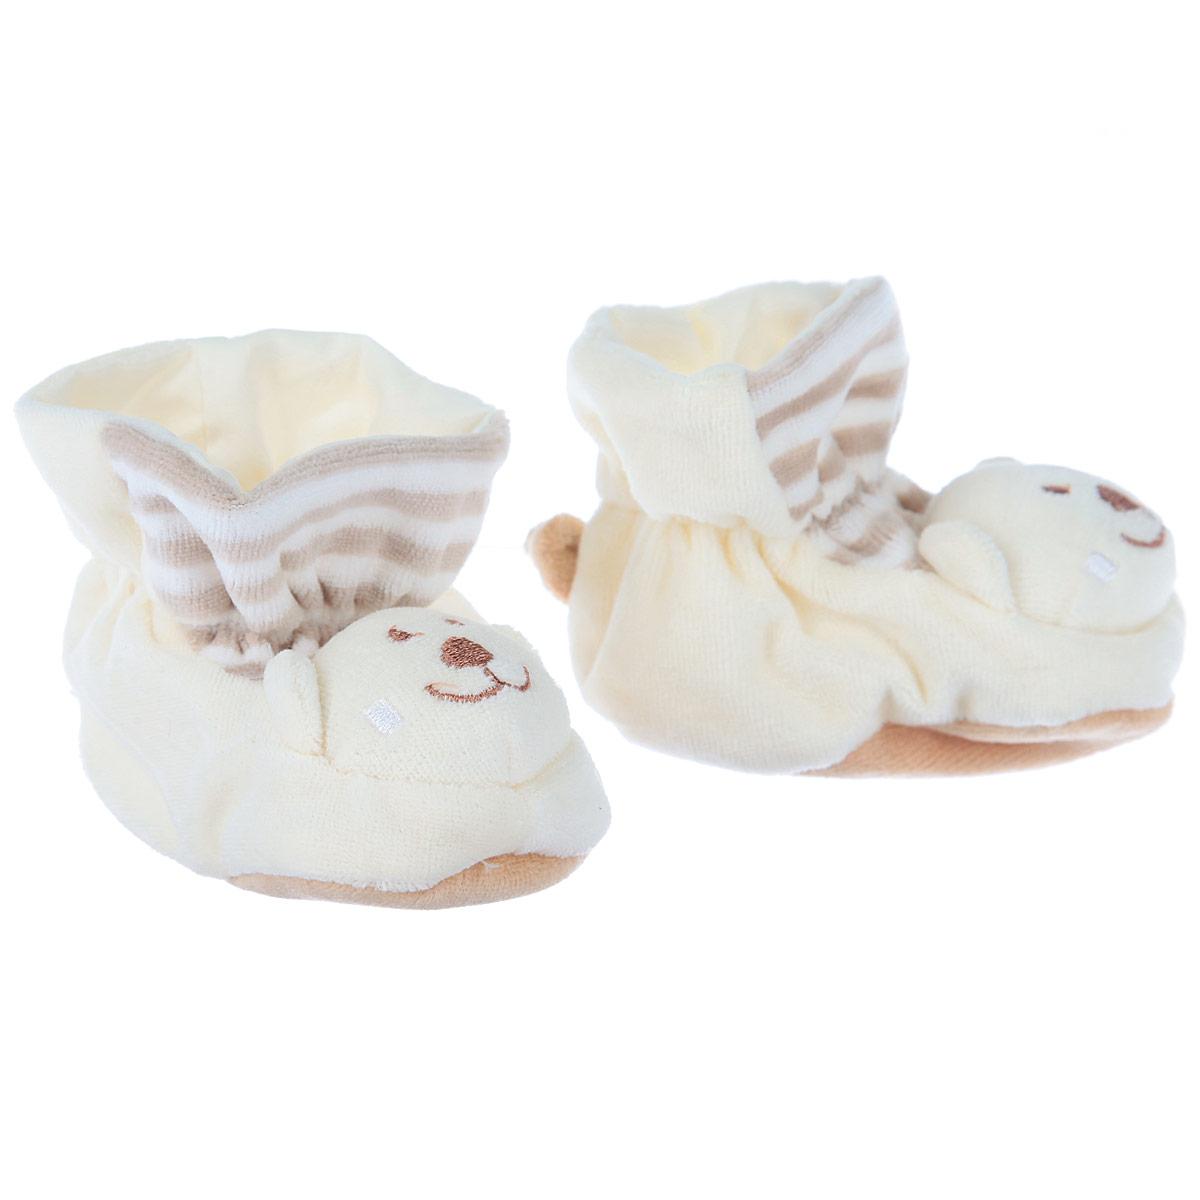 Пинетки Baby Nice Мишки, цвет: бежевый. Р47061. Возраст 0мес